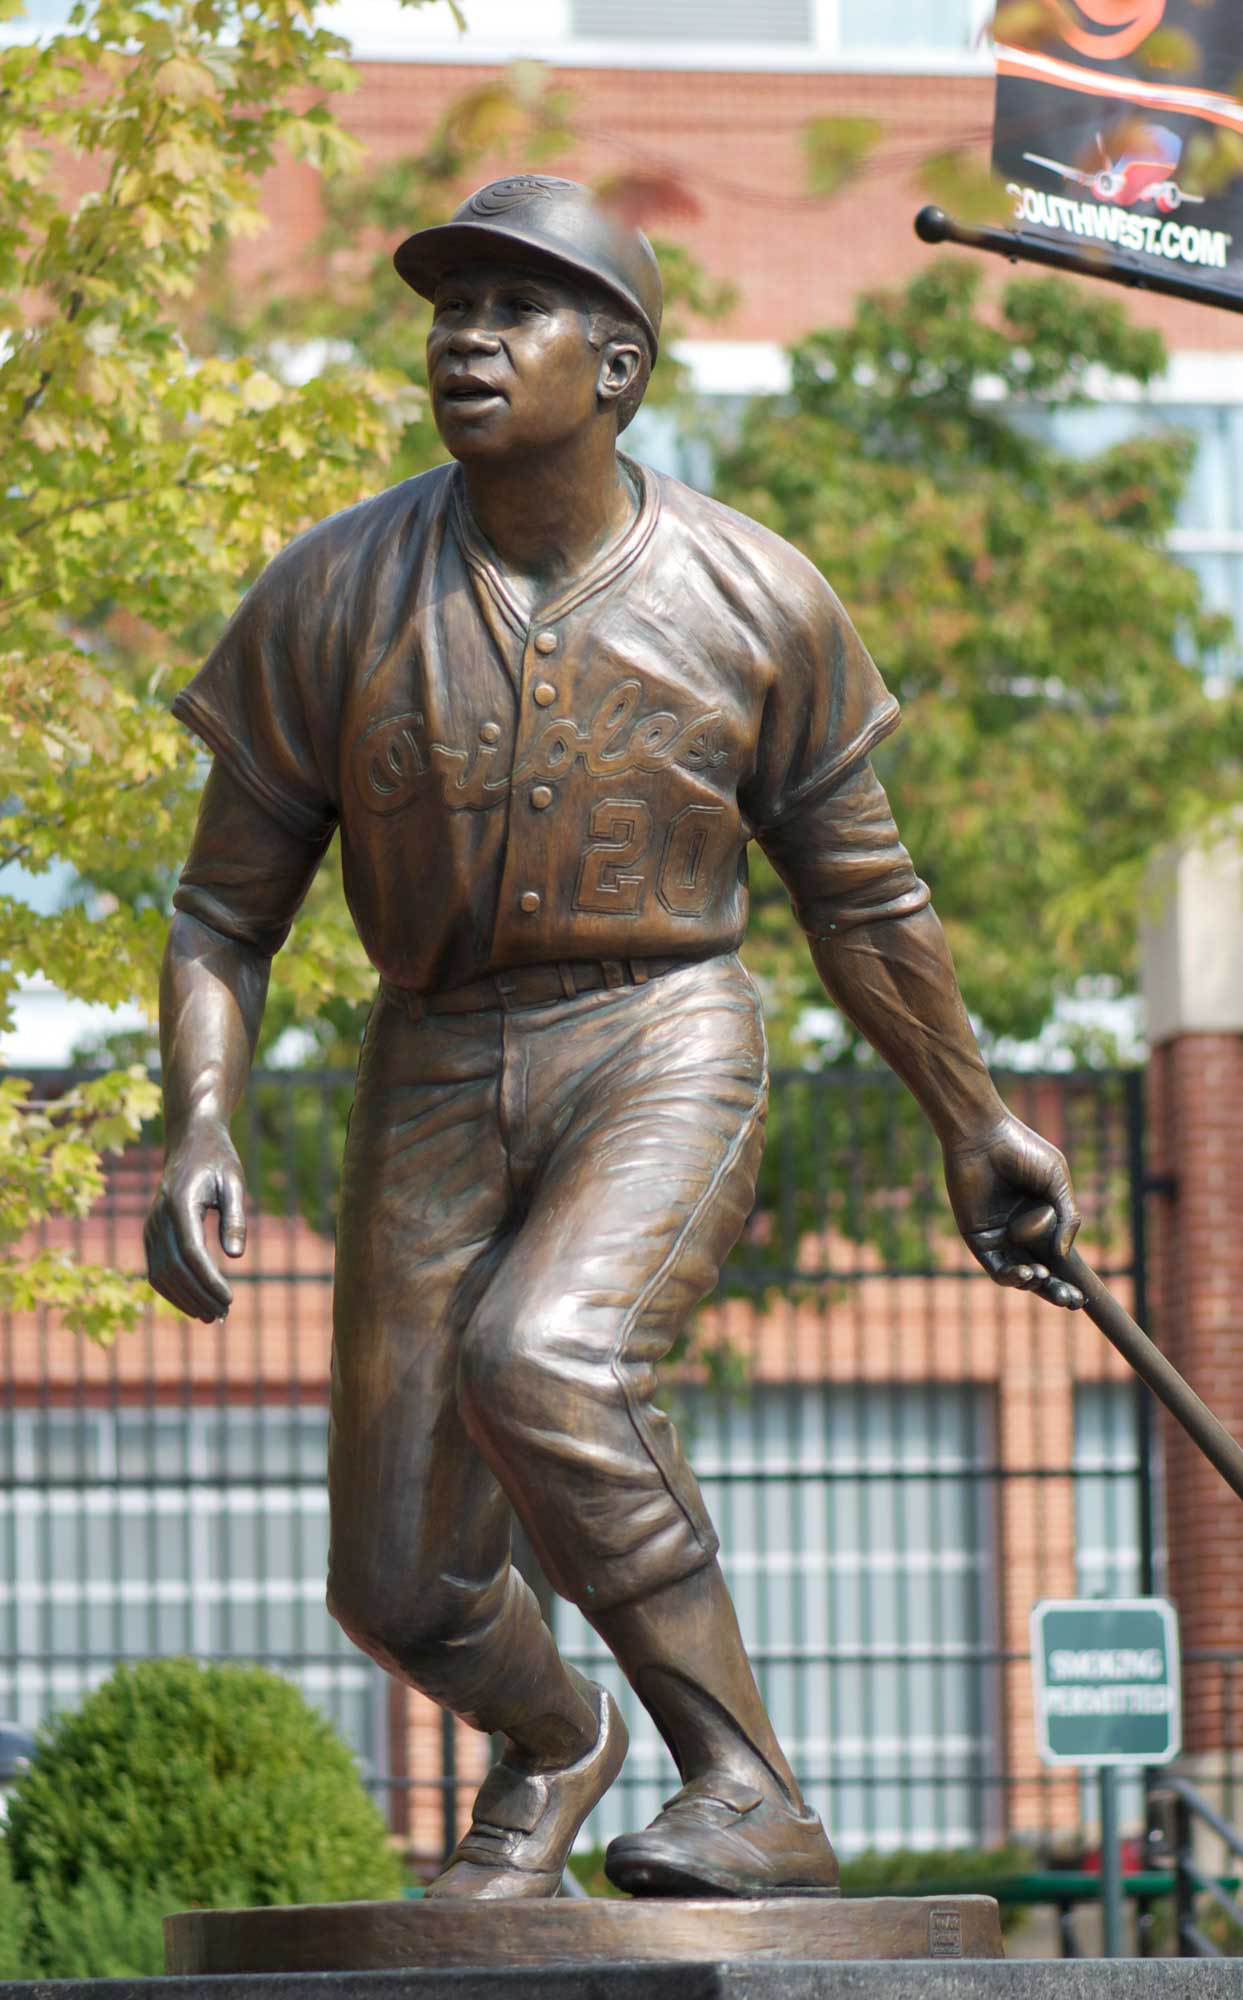 Frank-robinson-statue